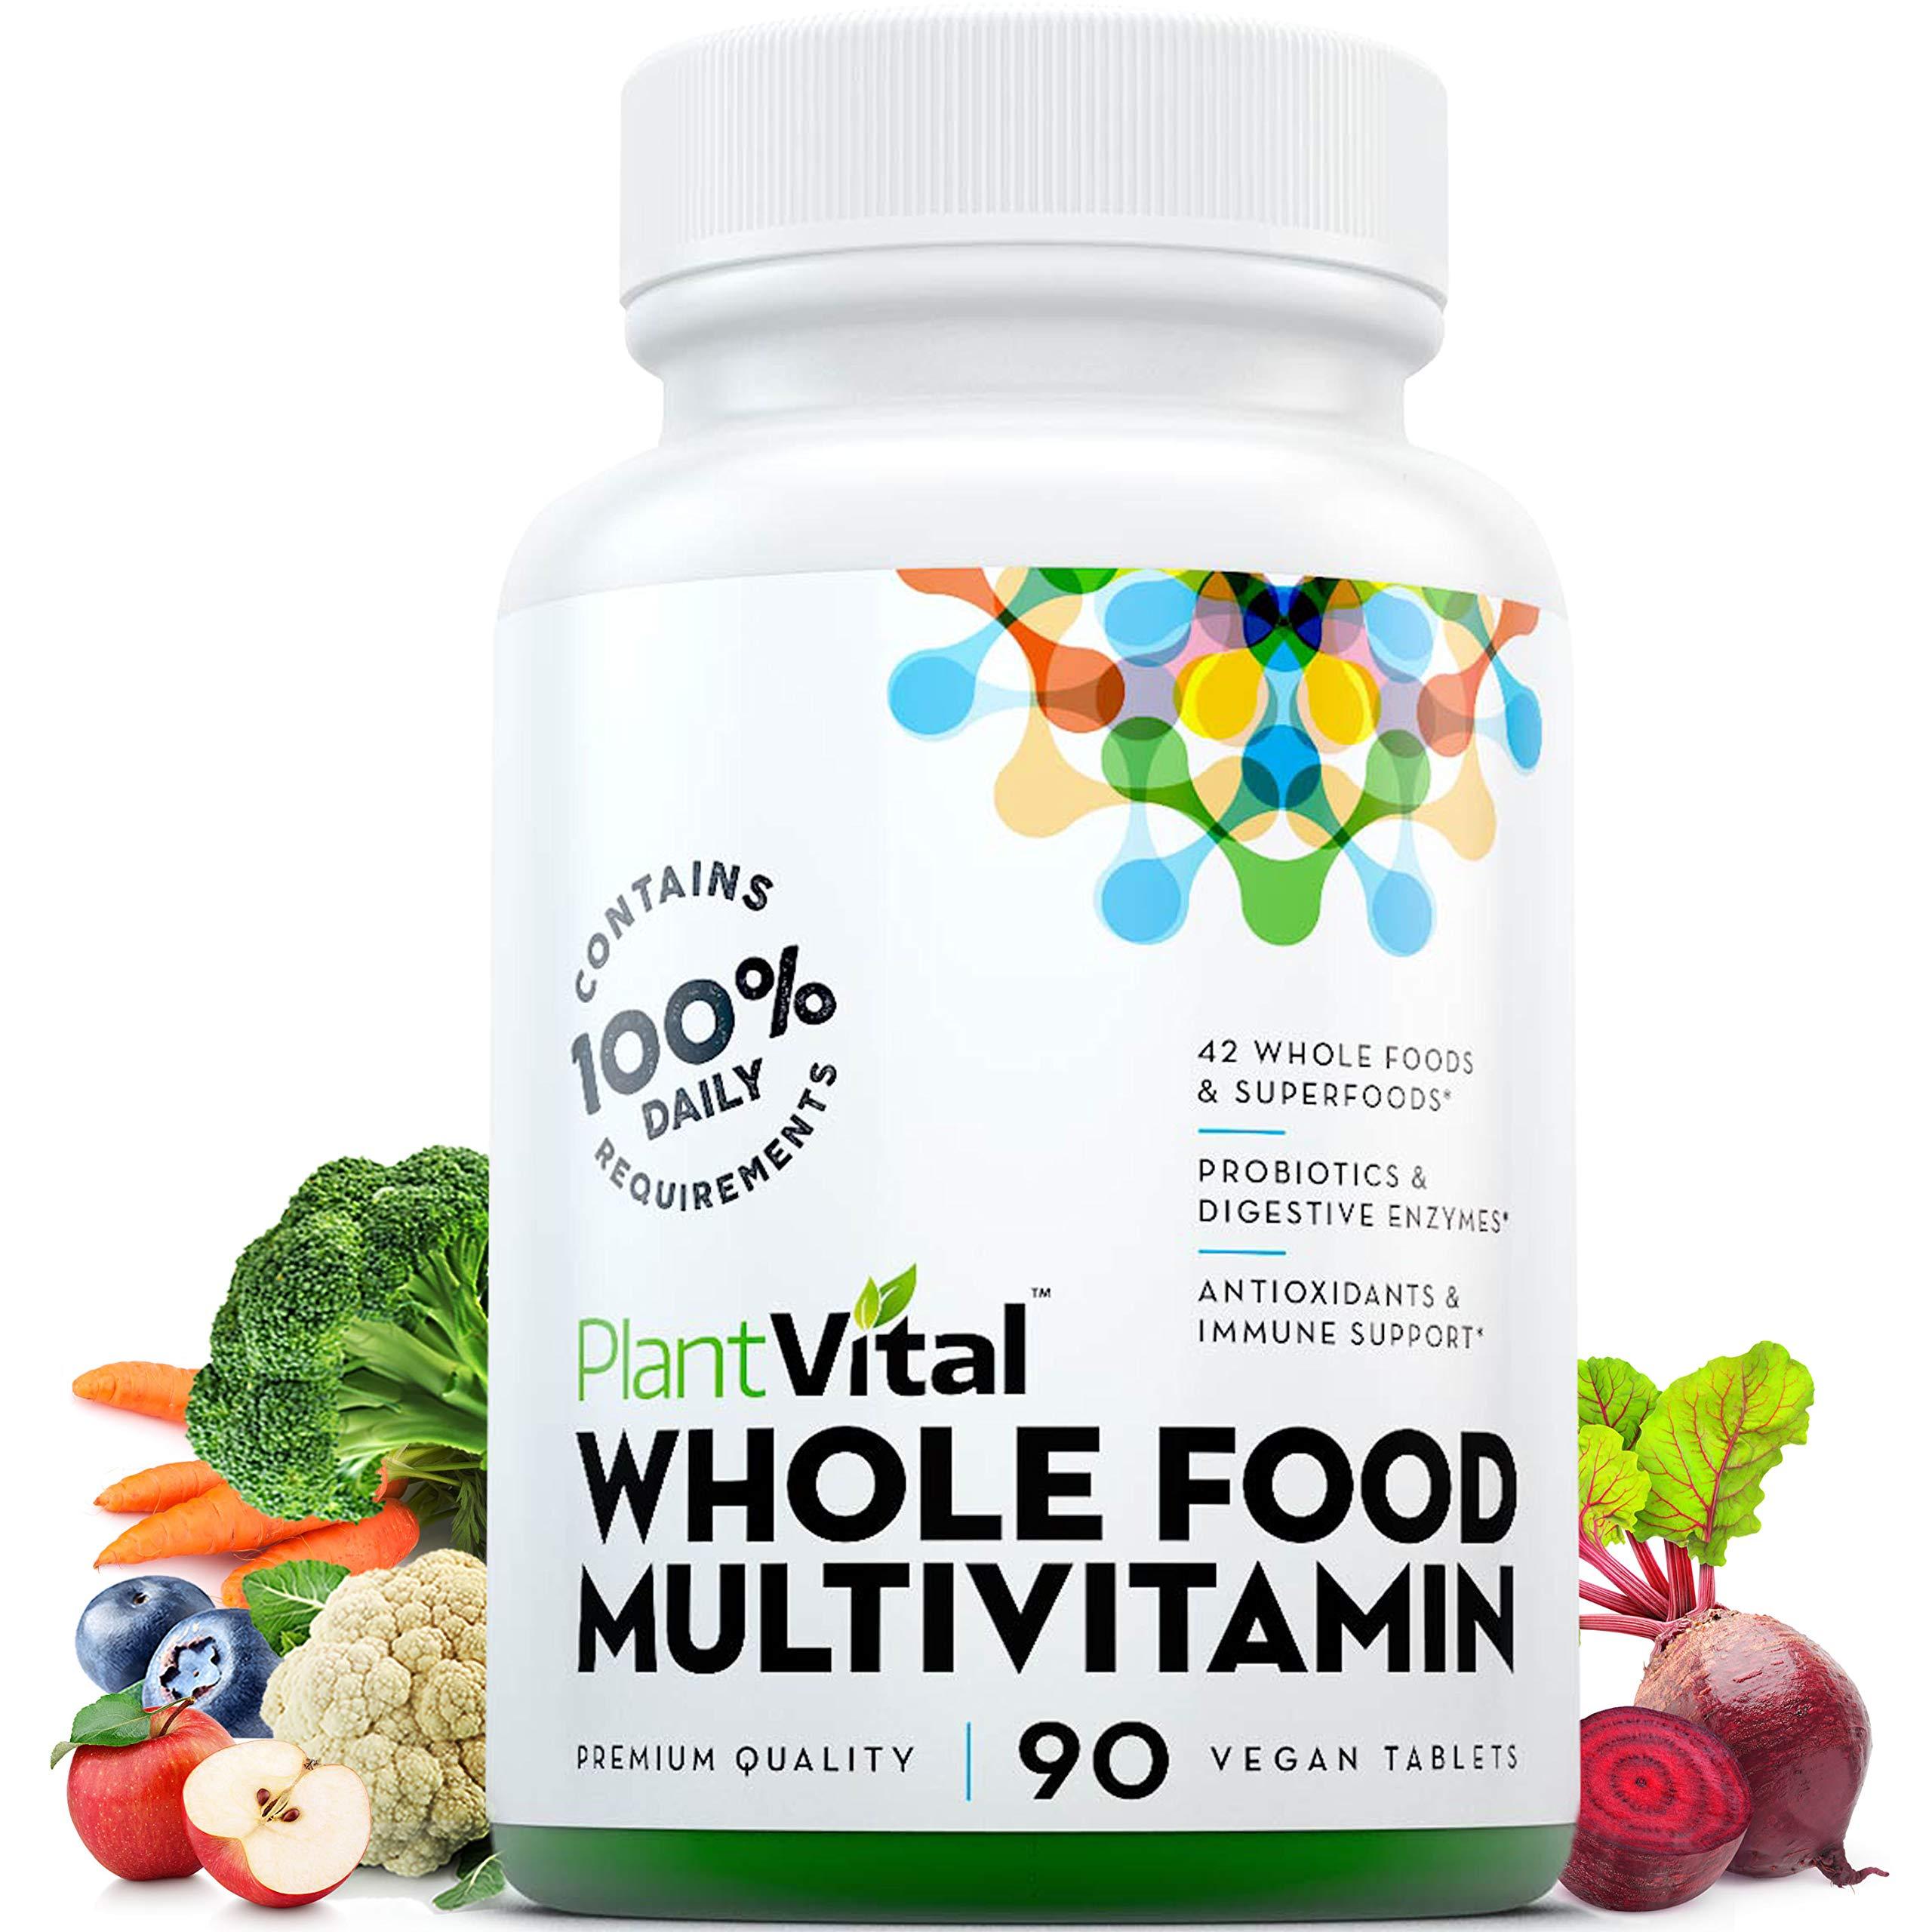 New! Whole Food MULTIVITAMIN